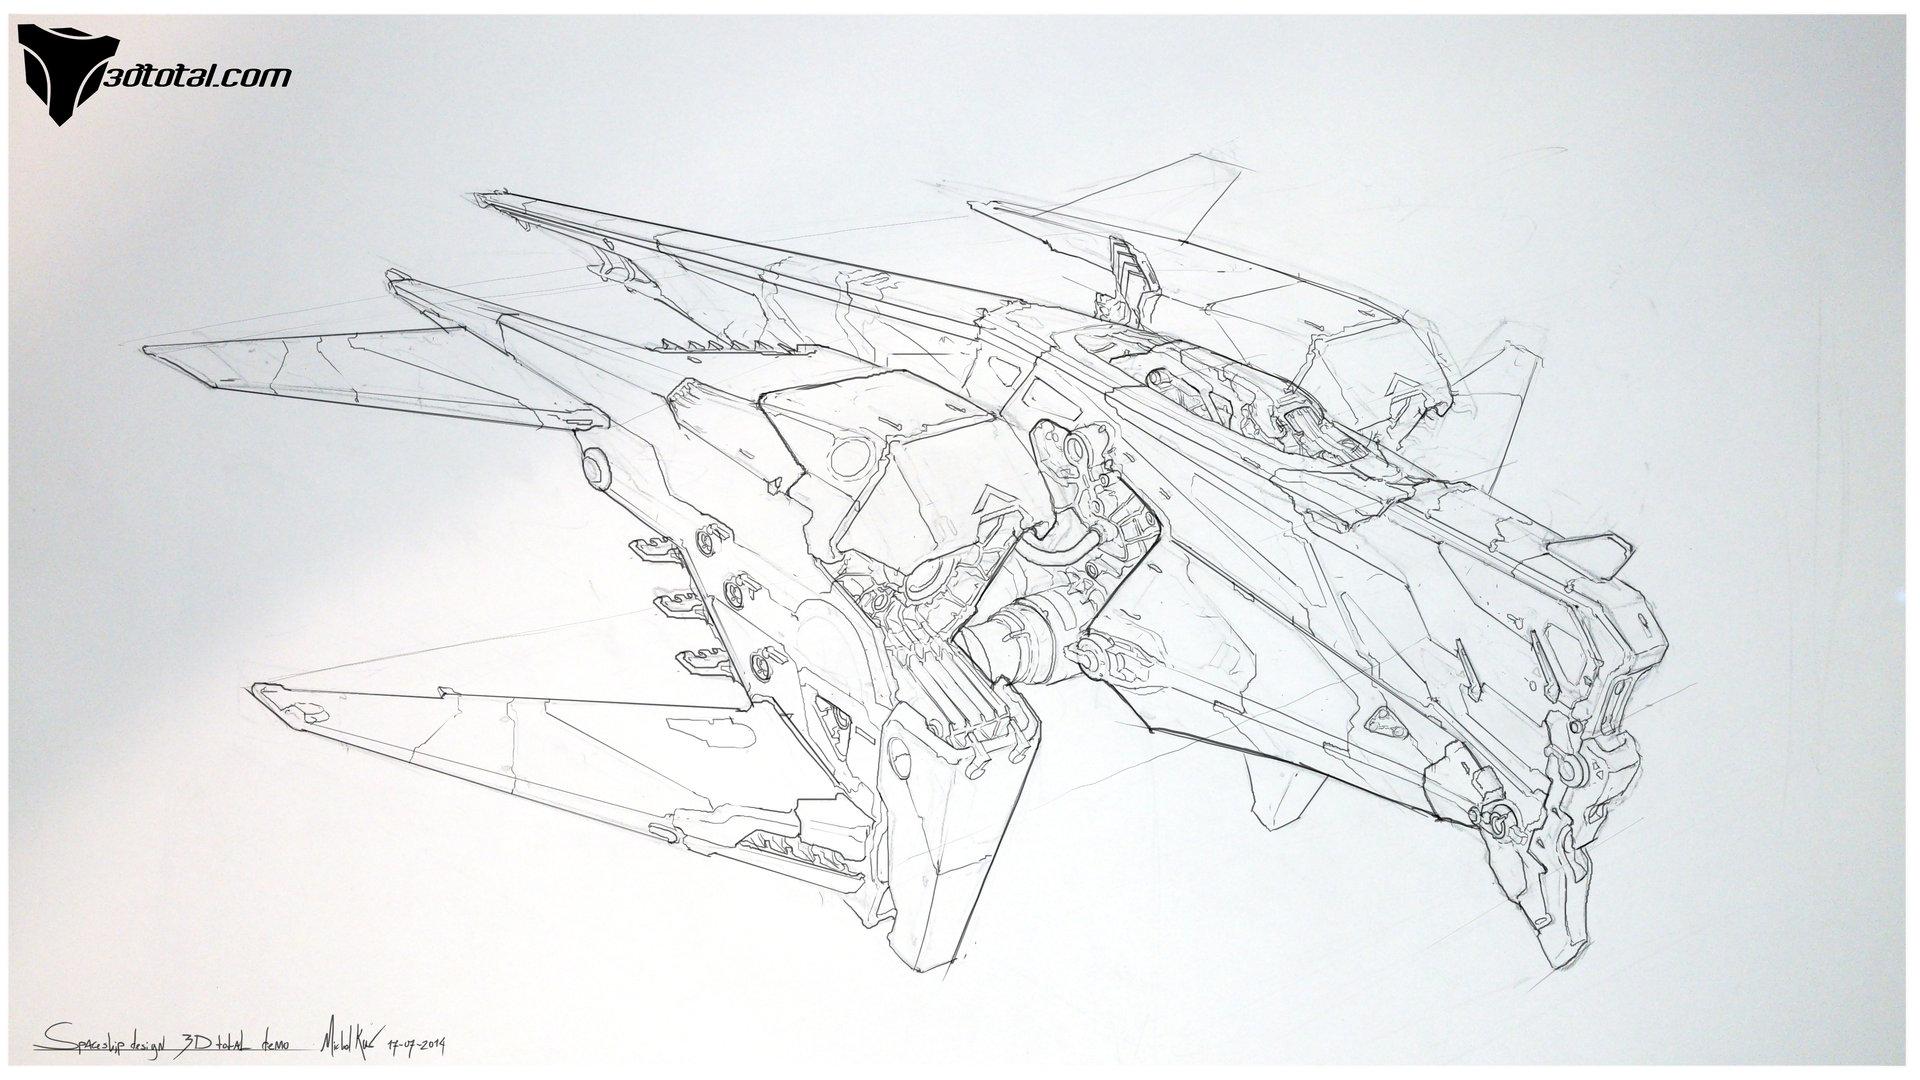 Michal kus 3d total sketch